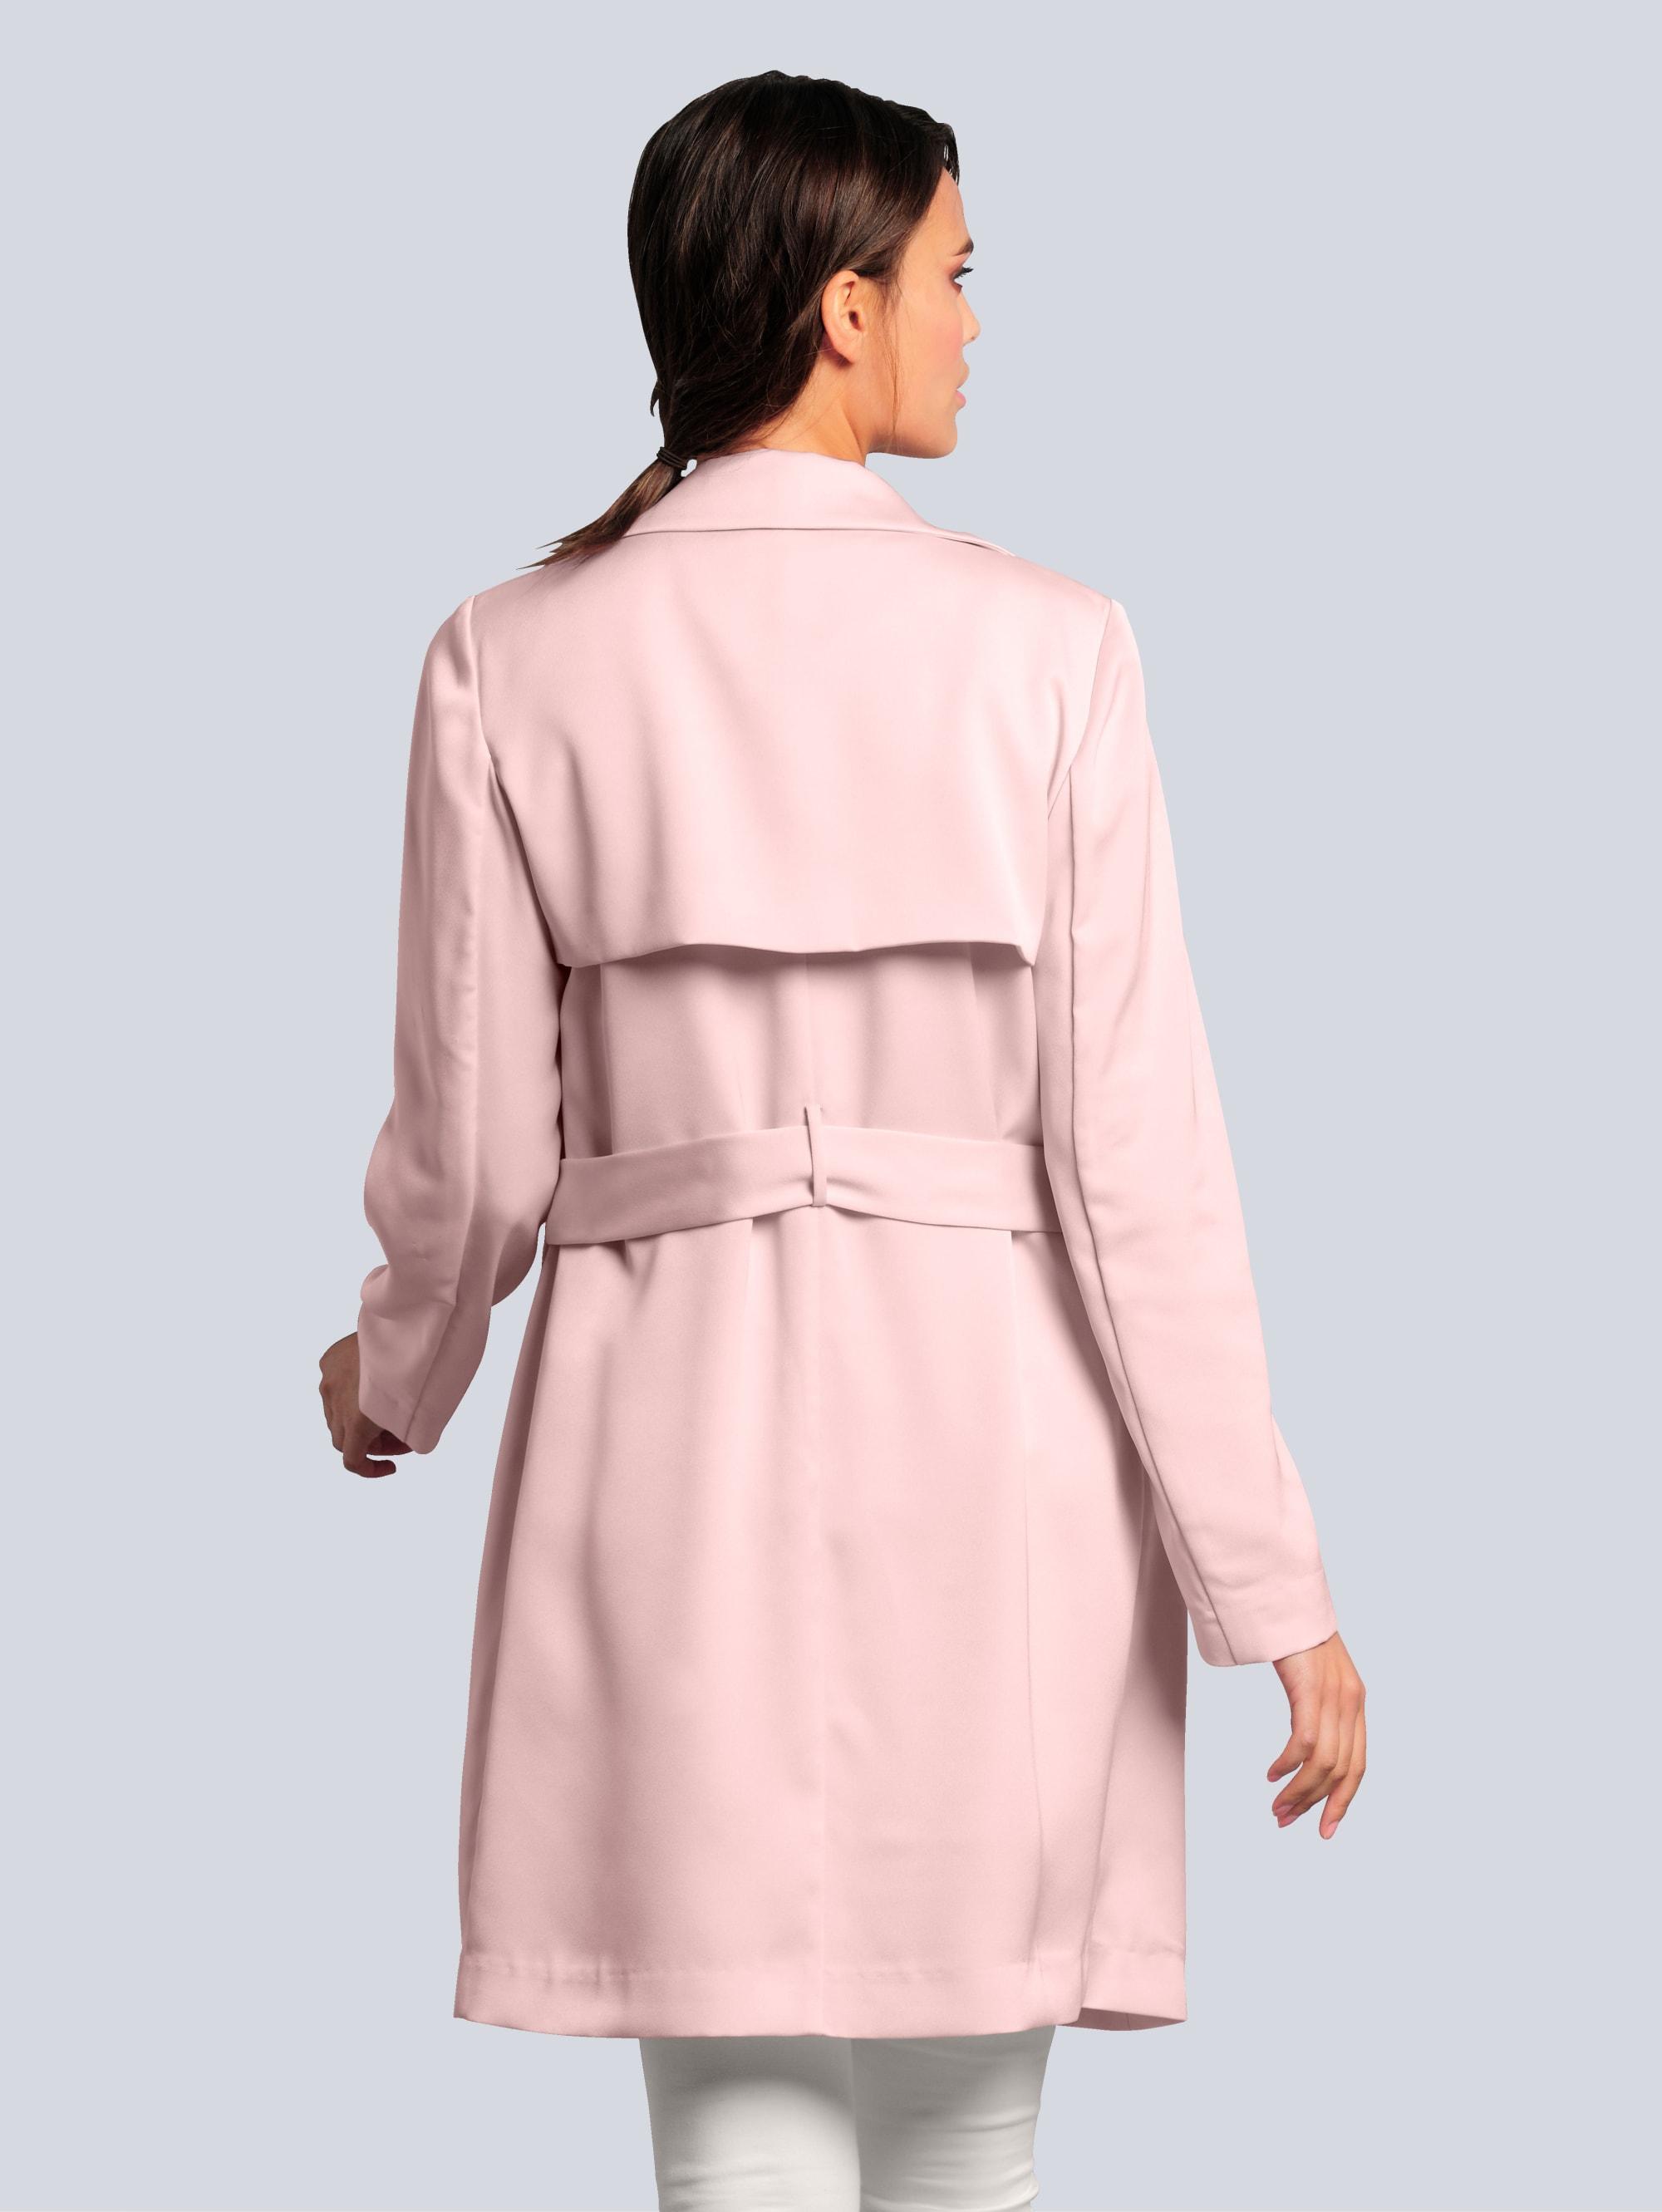 Alba Moda Kurzmantel in Rosé günstig kaufen